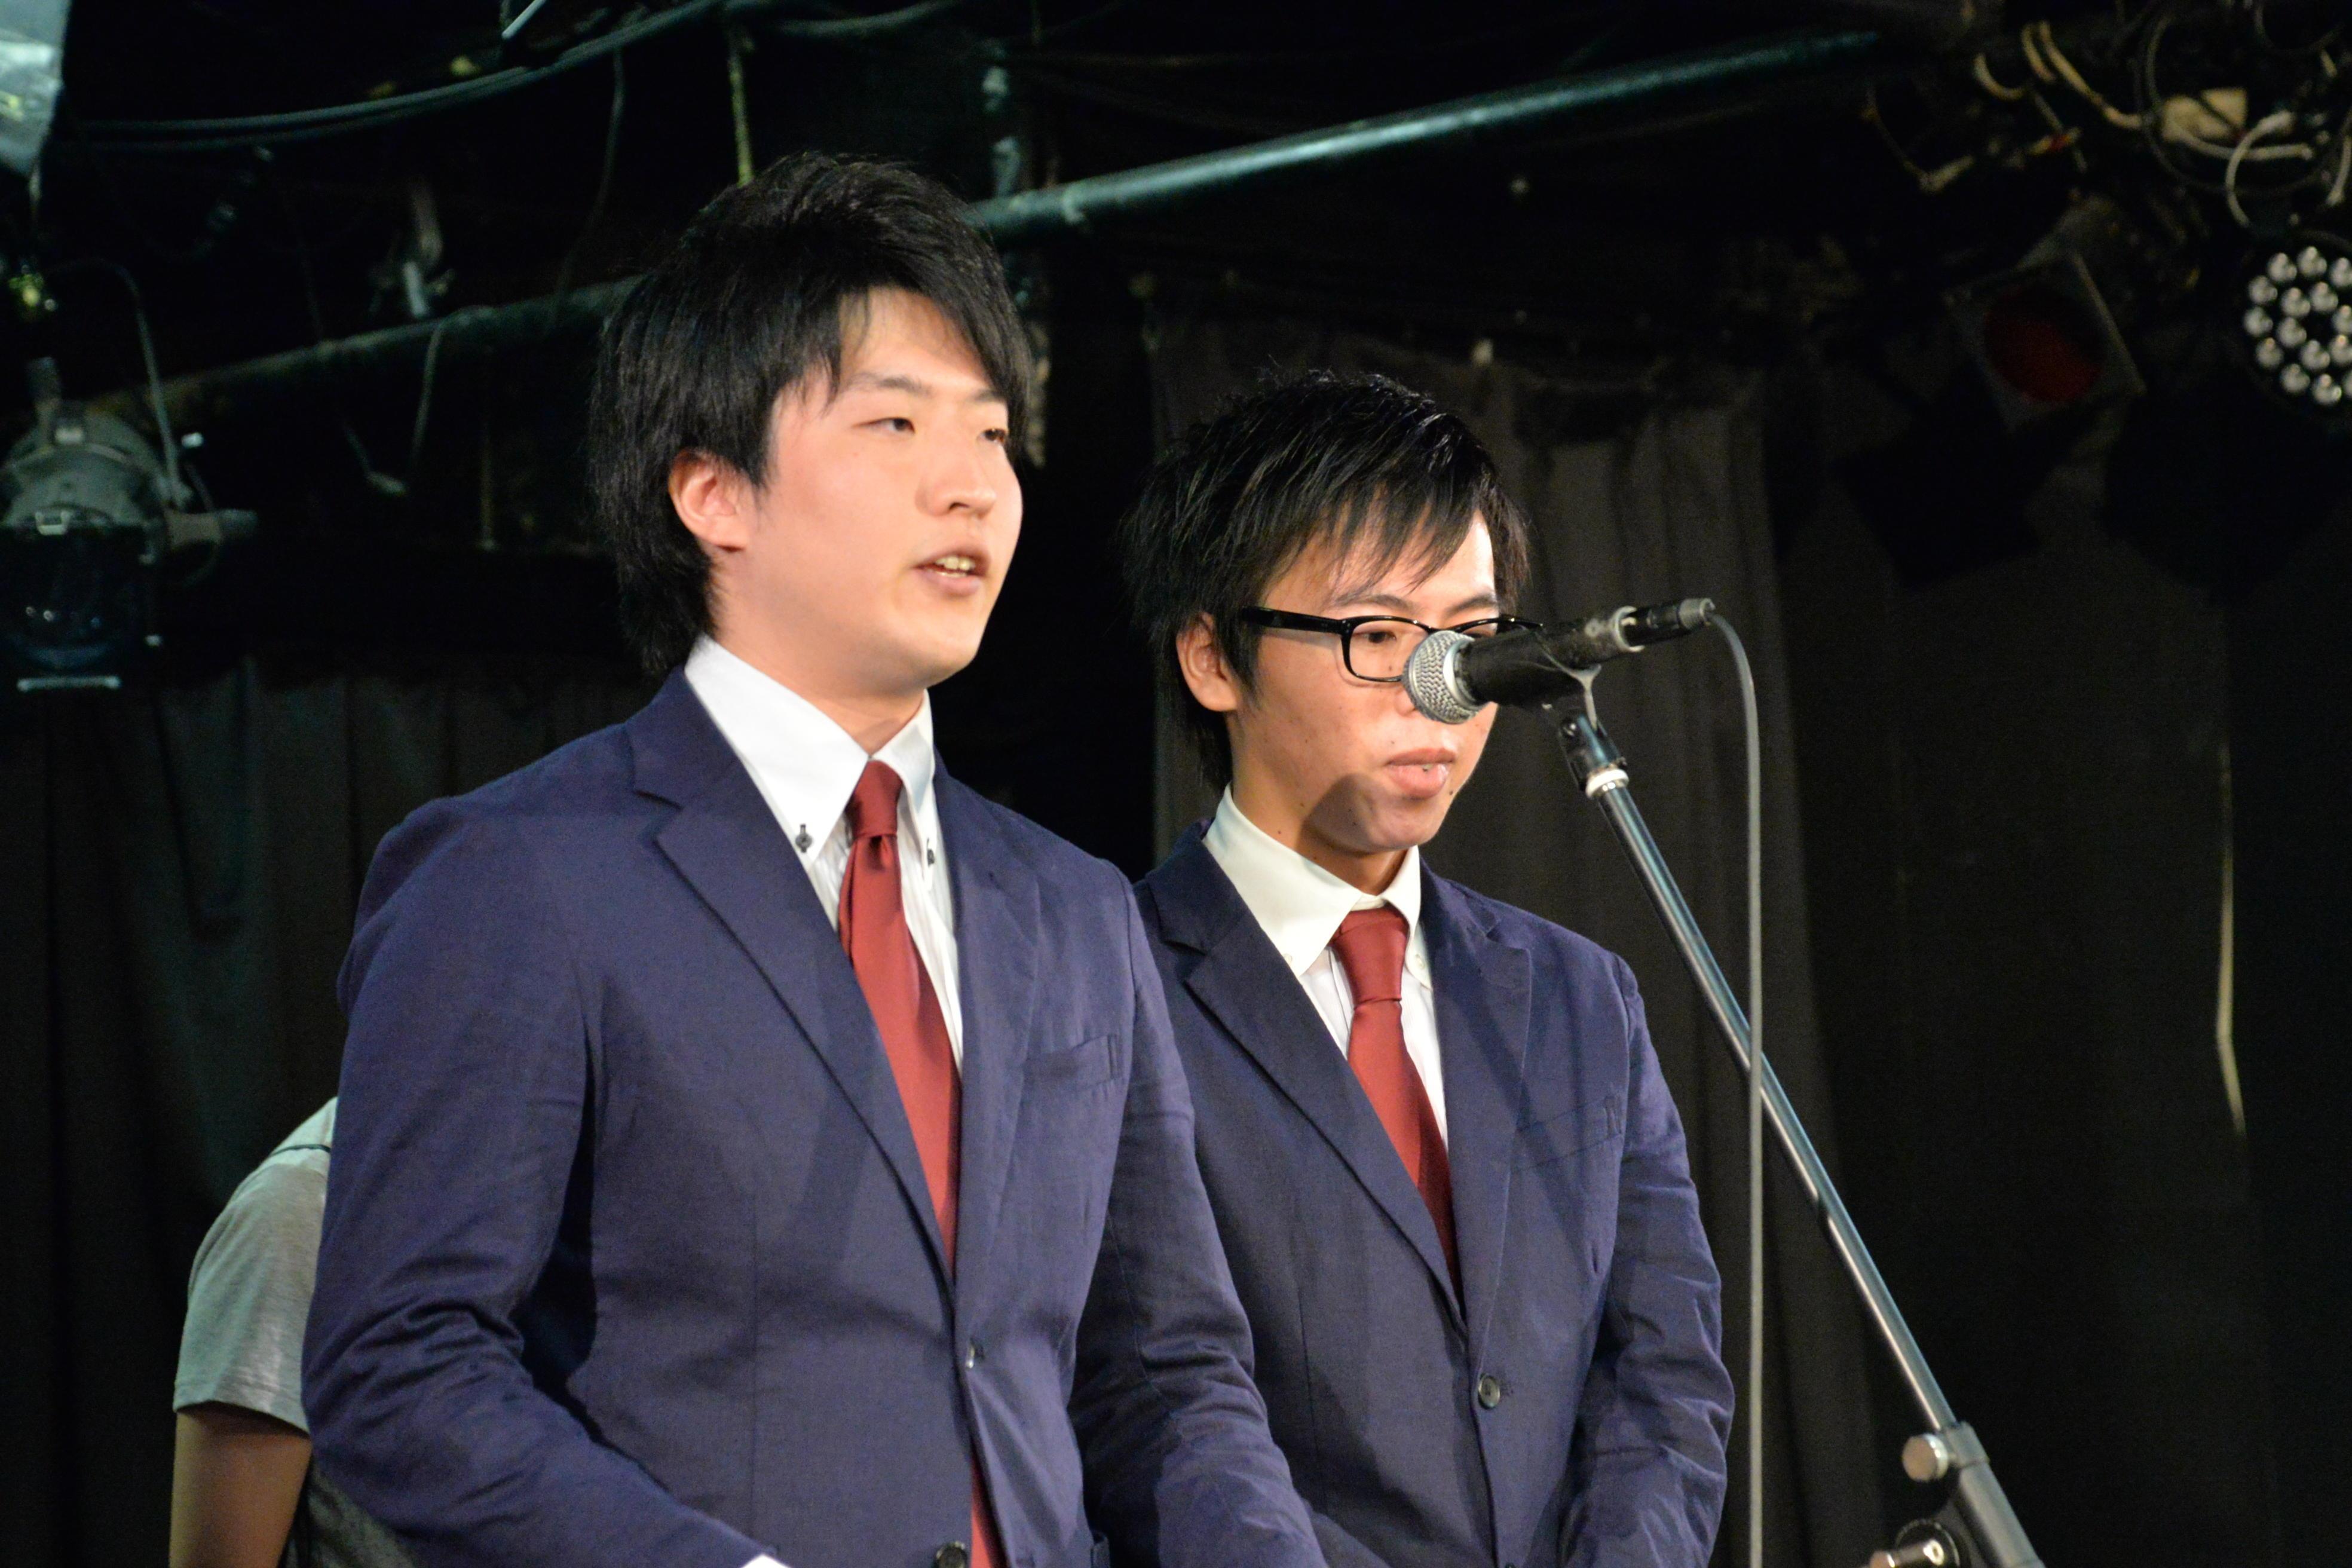 http://news.yoshimoto.co.jp/20180711161138-225210d45d5236c4cdb3c3b749812cfbff7e231a.jpg